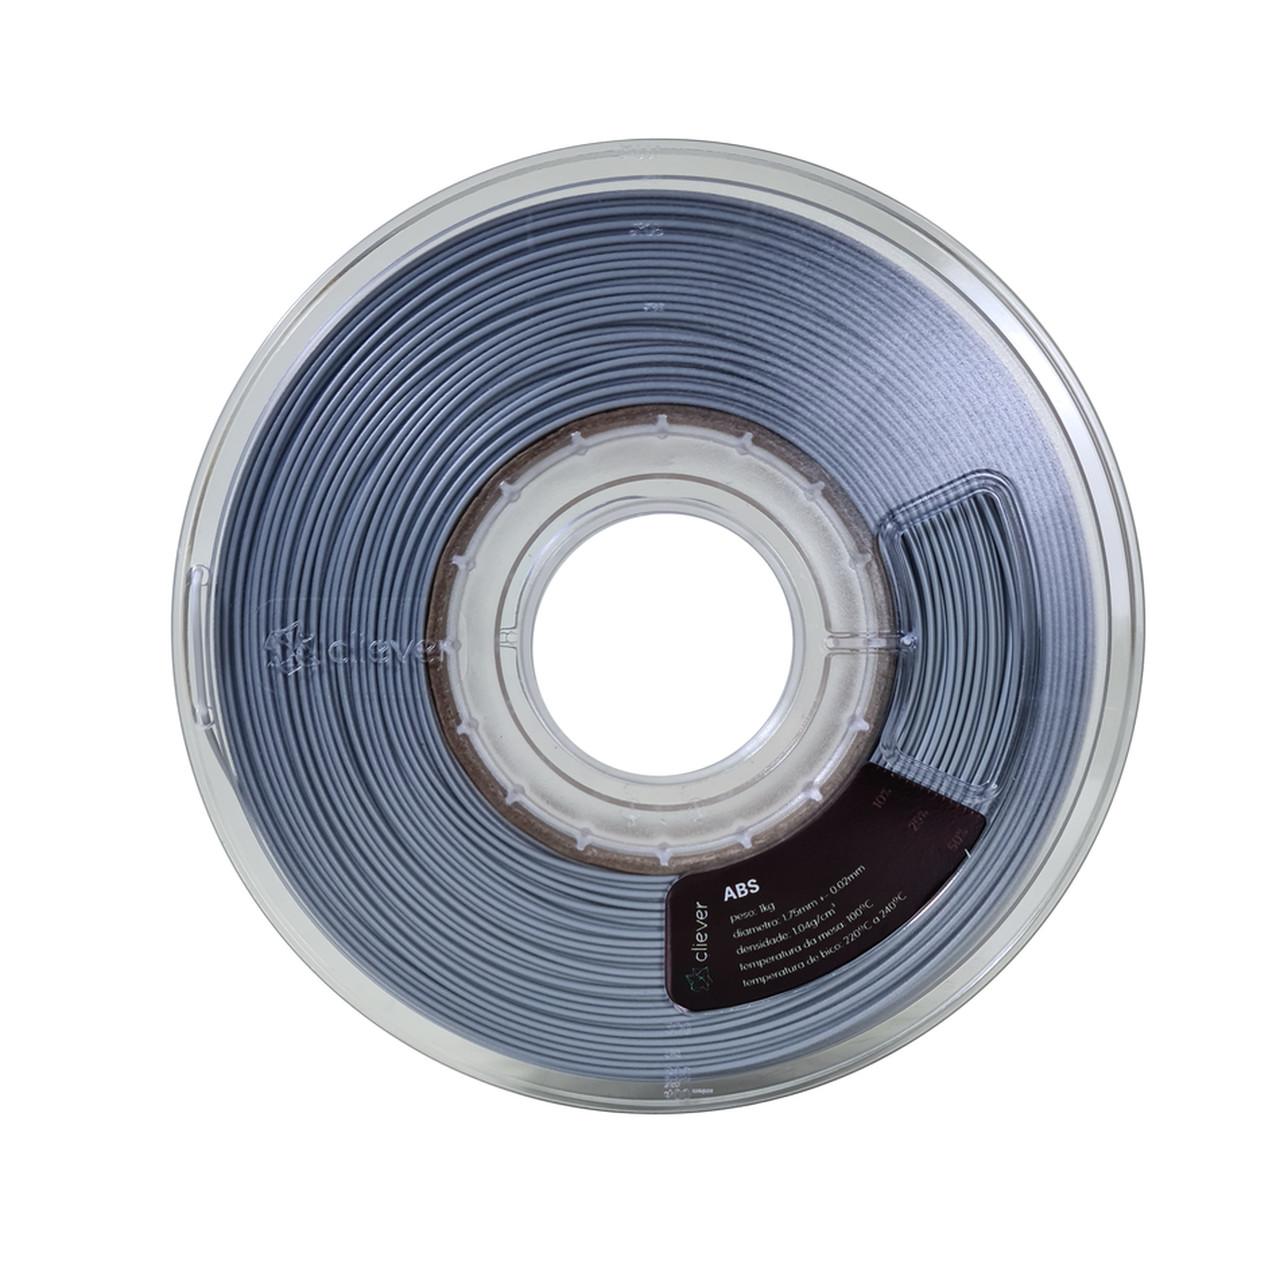 Filamento ABS - Alumínio - Cliever - 1.75mm - 1kg